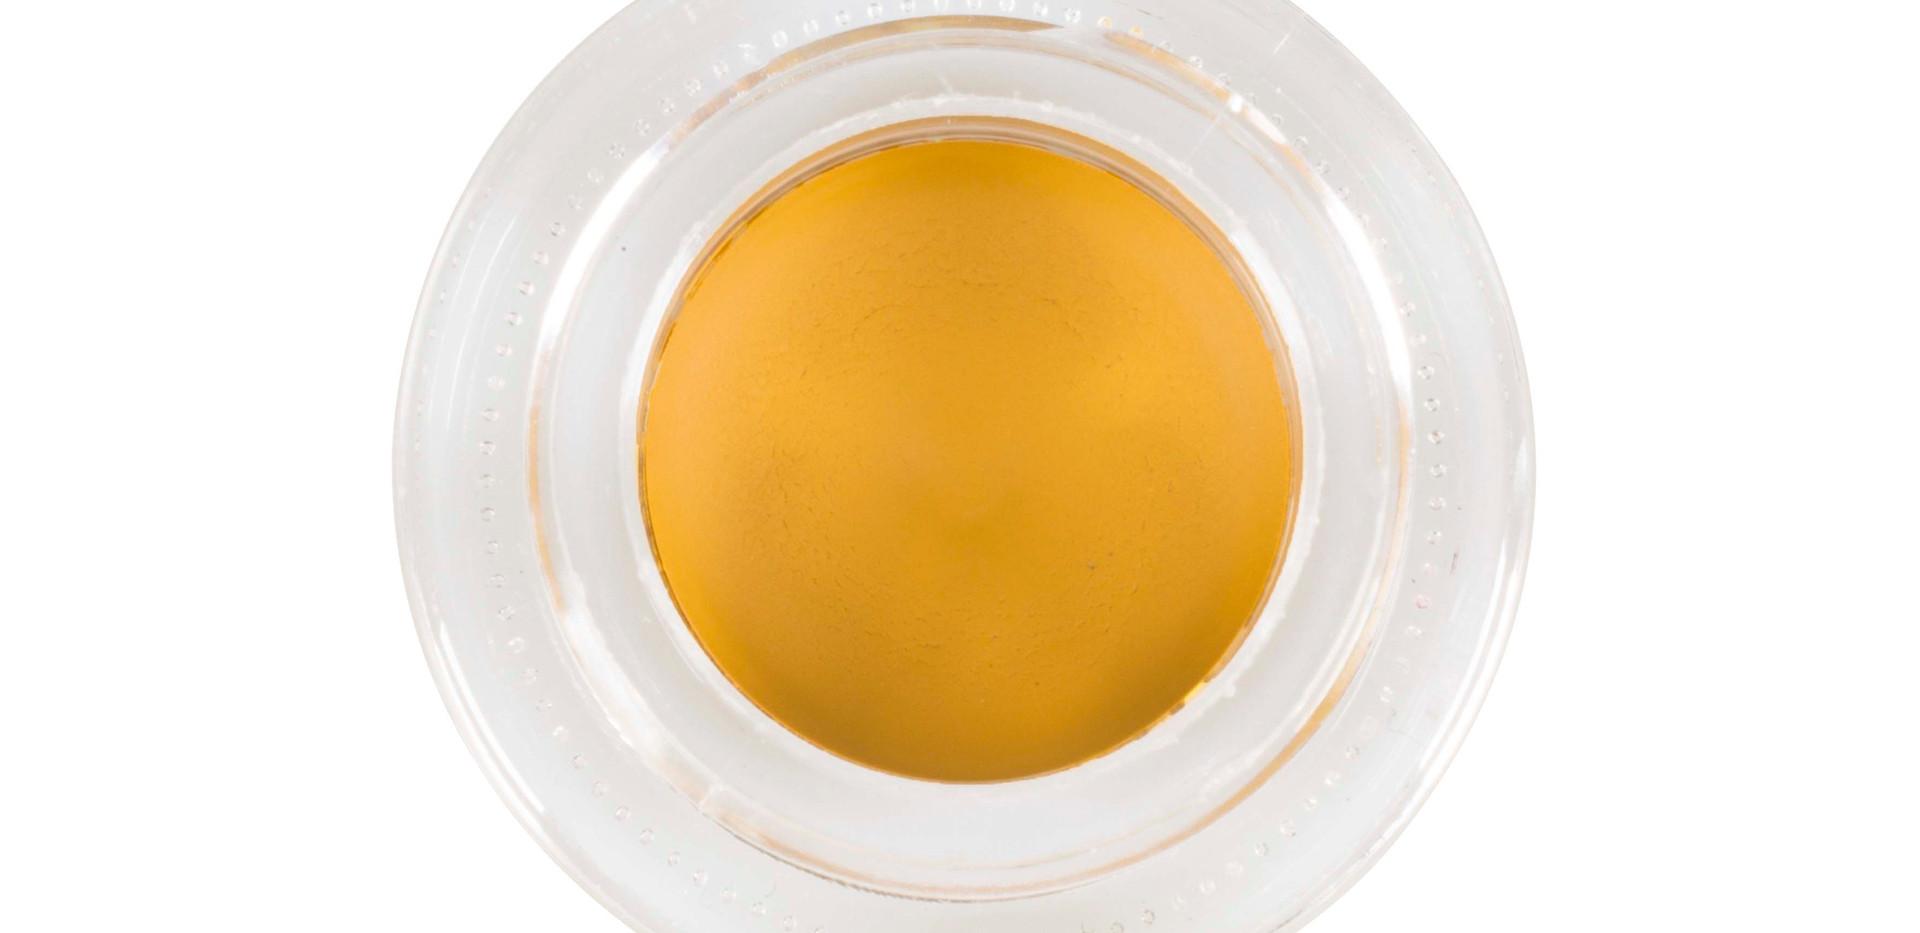 Delineador em Gel Colorido Dapop - DP2014 (cor amarela)